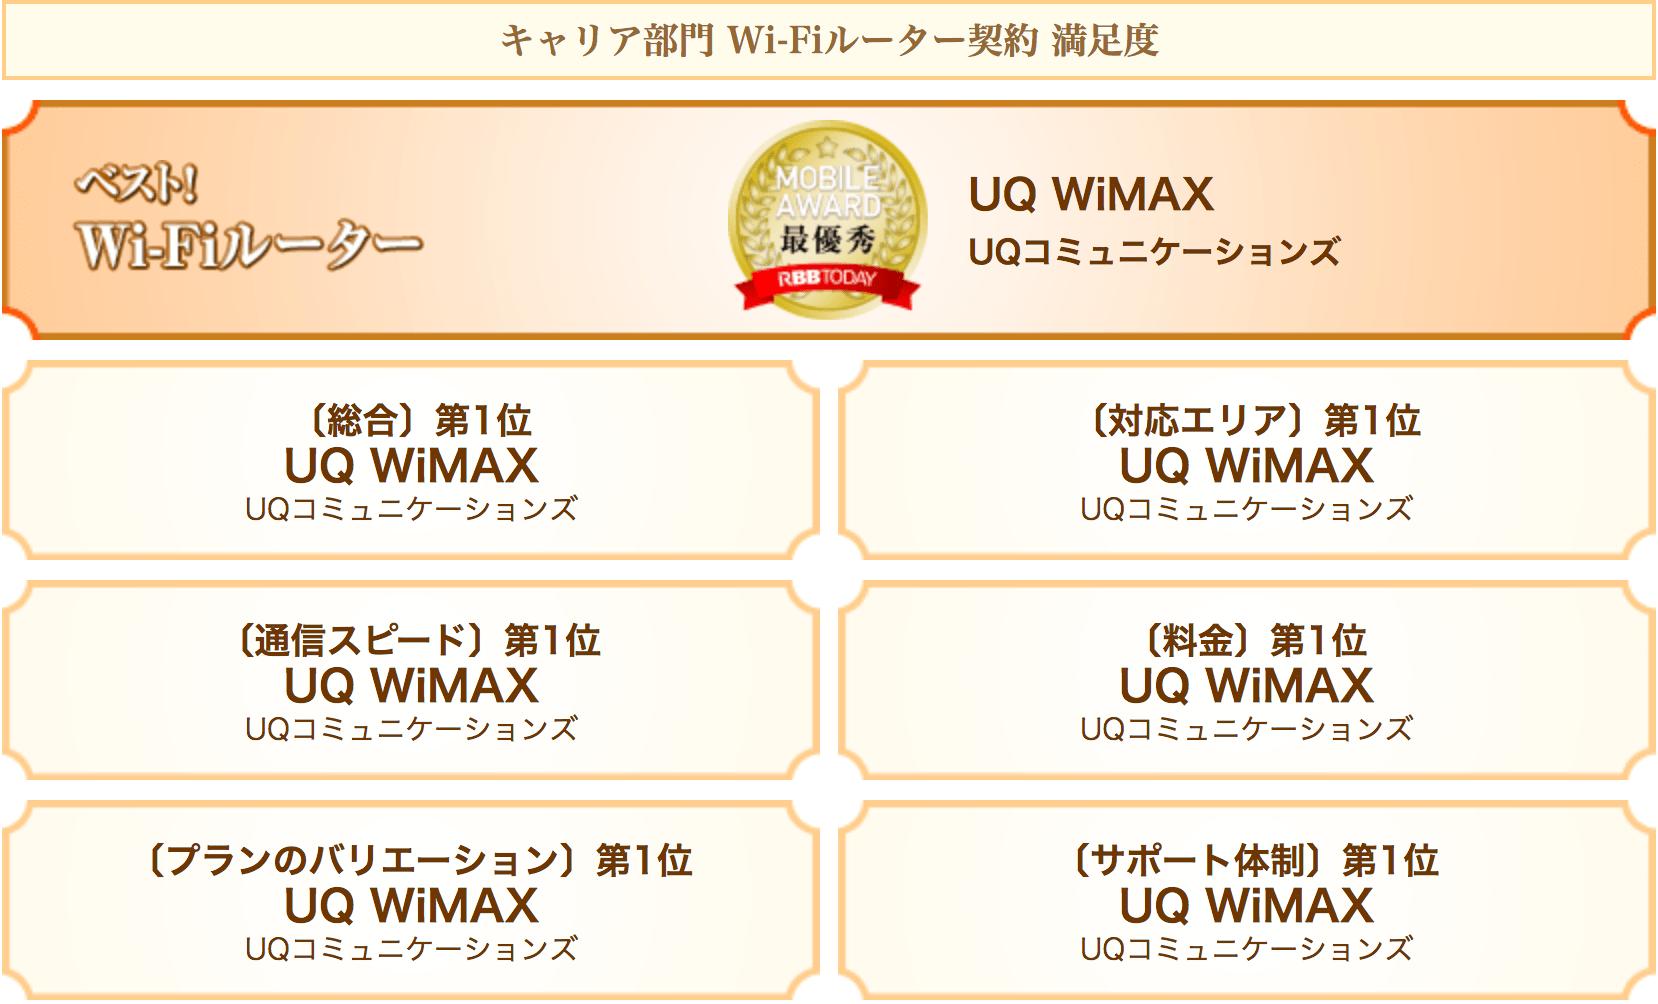 WiMAXがモバイルアワードで満足度No1を受賞した画像